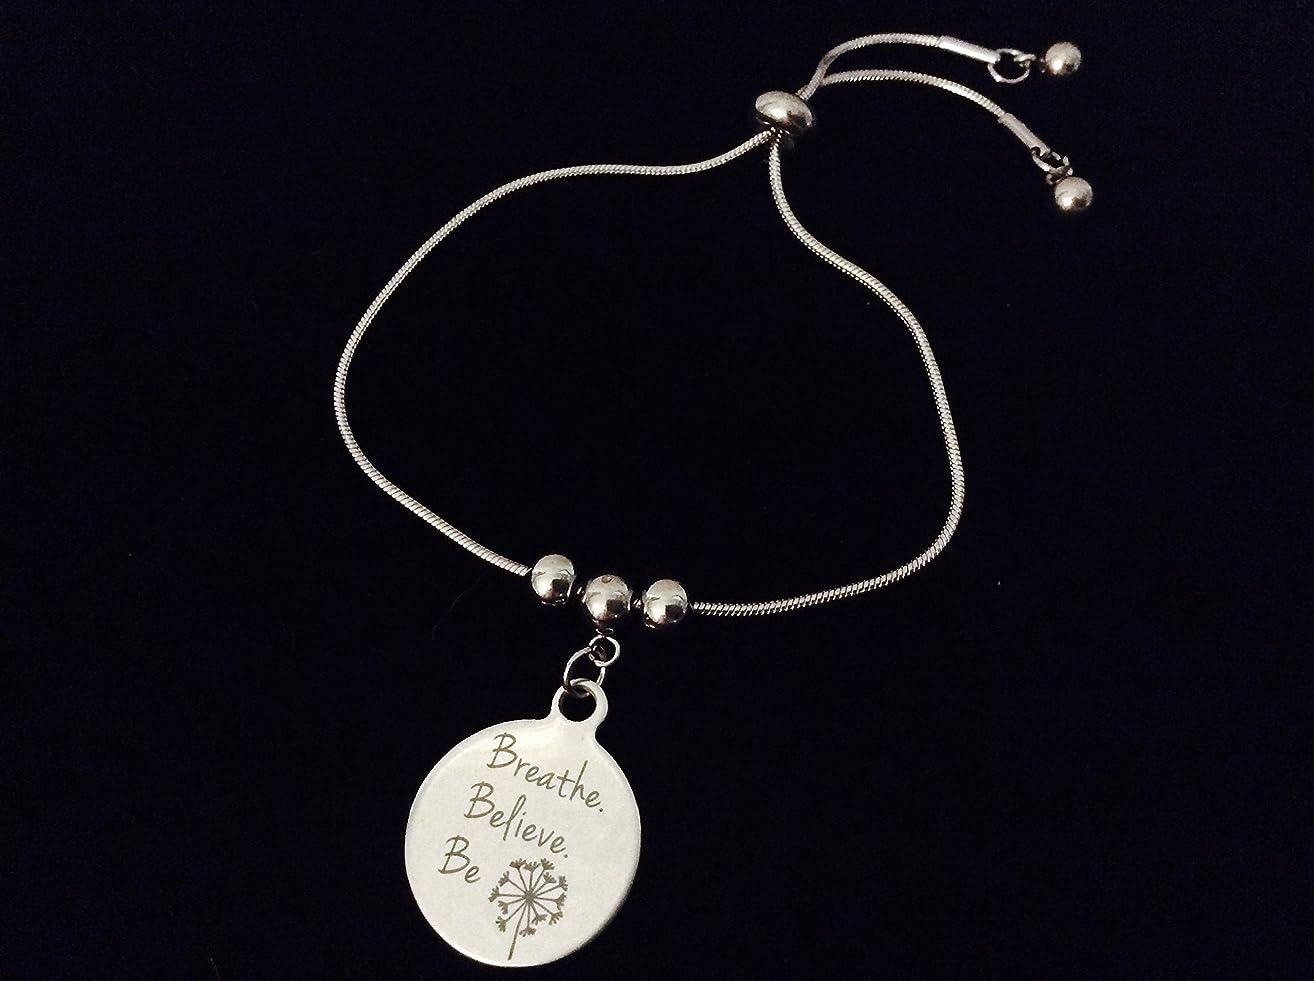 Breathe Believe Be Adjustable Bolo Bracelet Stainless Steel Adjustable Bracelet Slider Charm Bracelet Dandelion Gift One Size Fits All